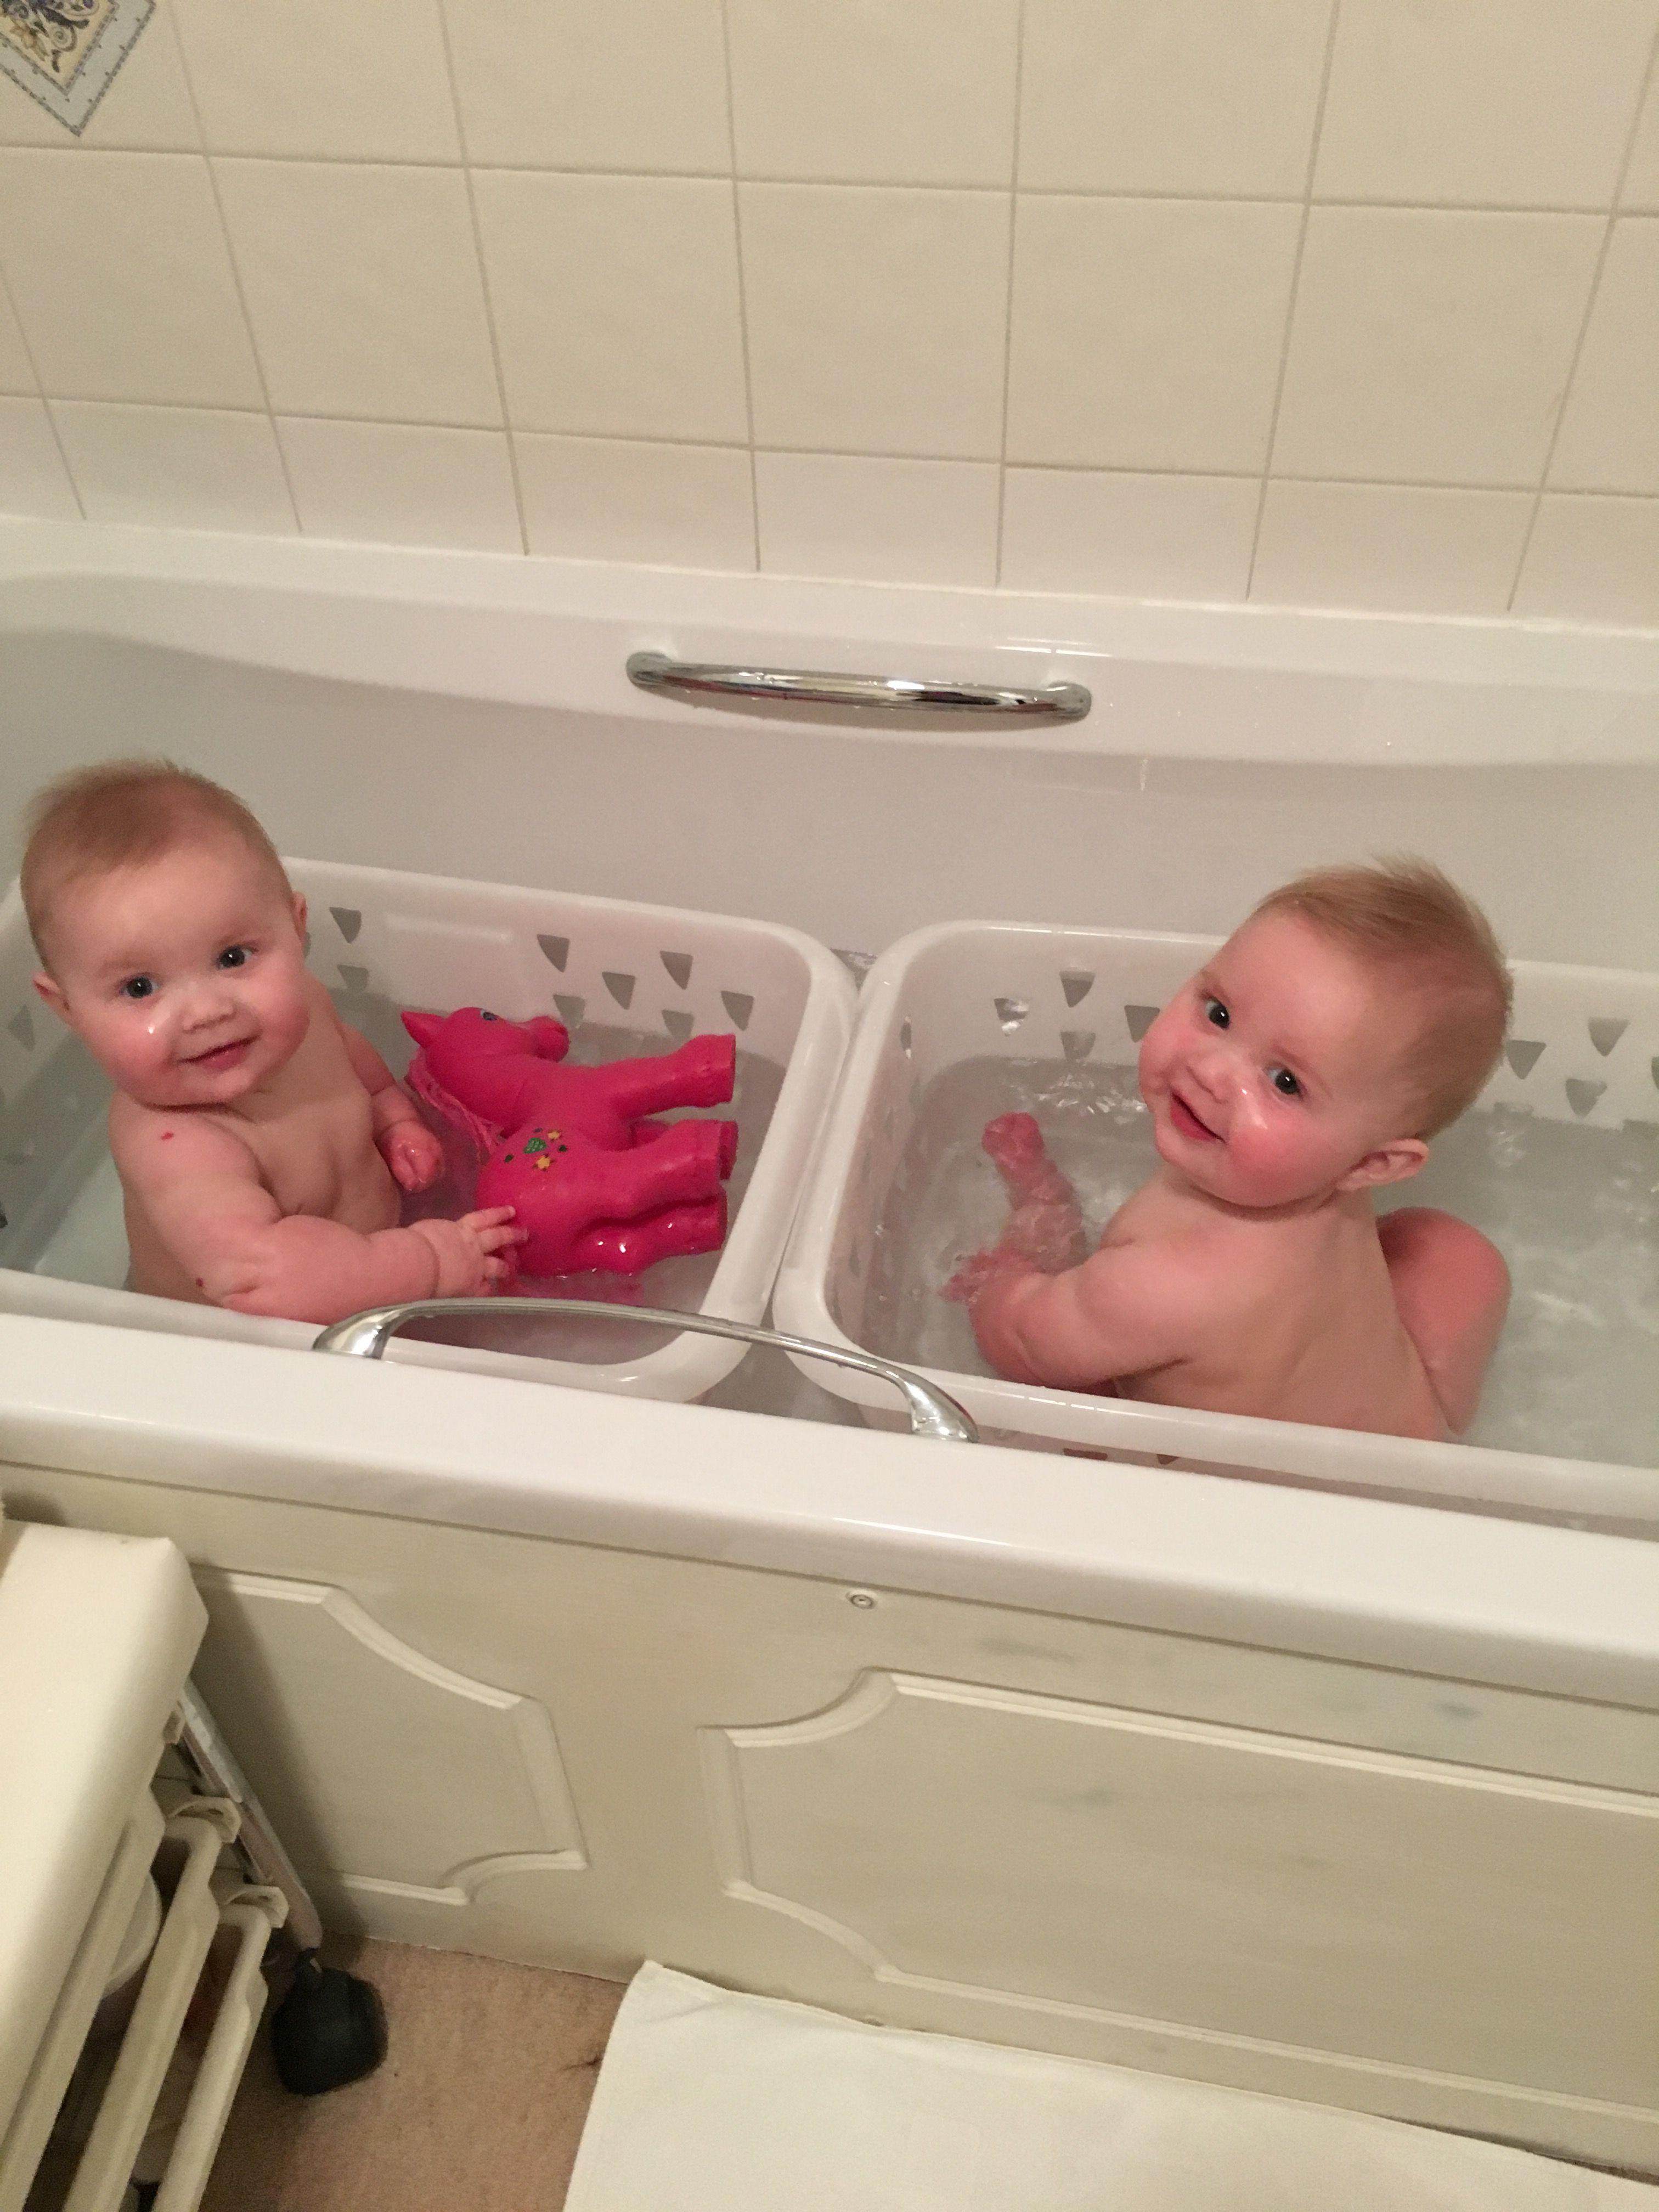 Makeshift baby bath seats   Babies   Pinterest   Baby bath seat ...